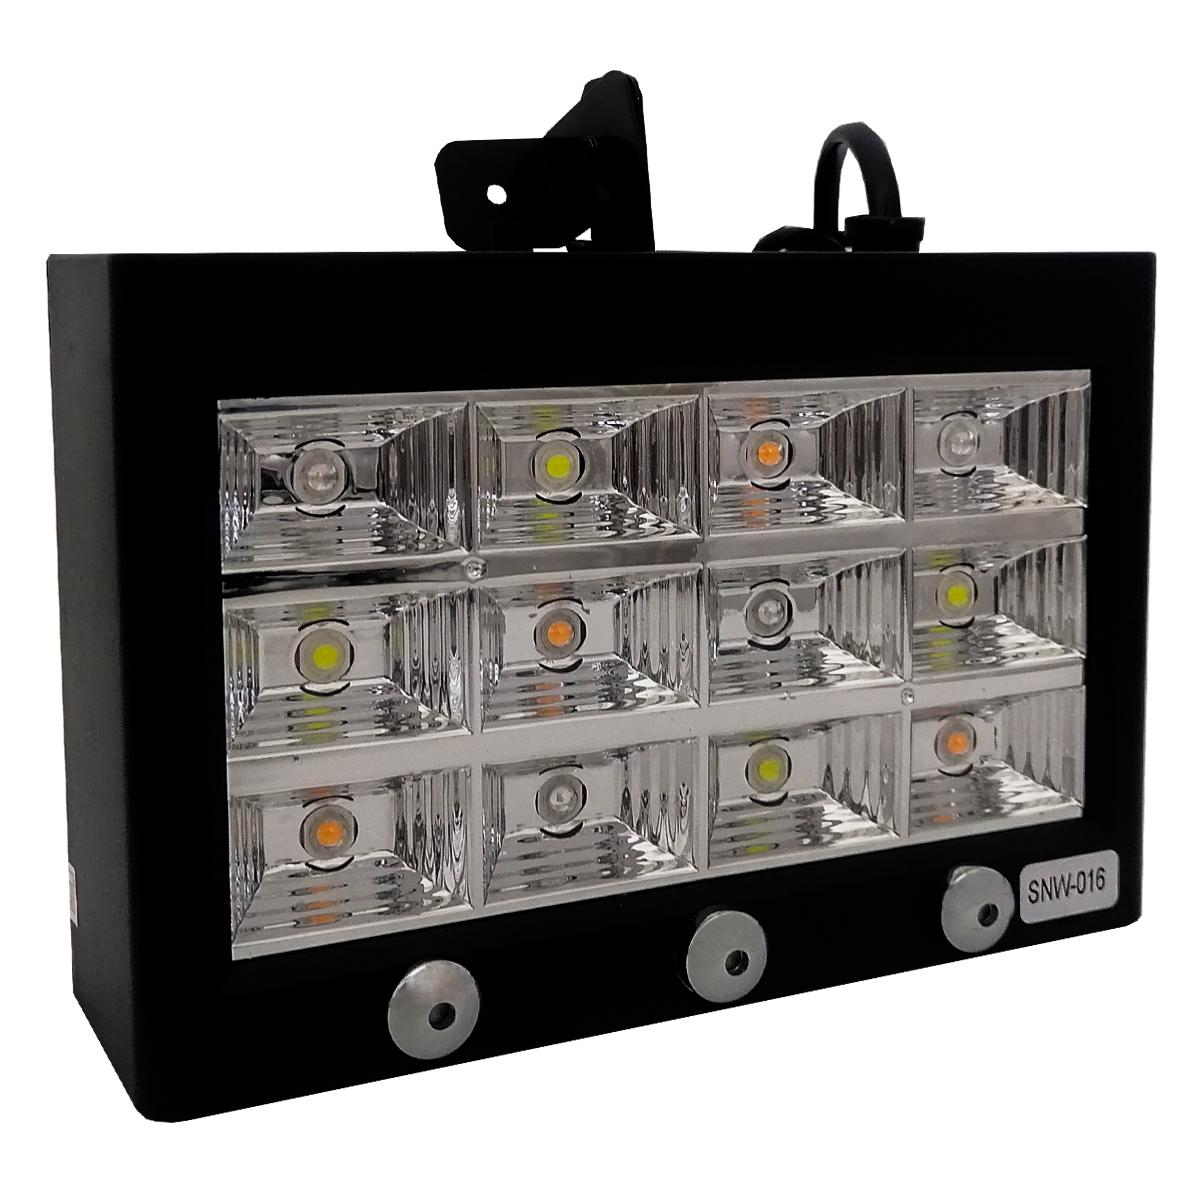 خرید                                     رقص نور لیزری مدل SNW-016